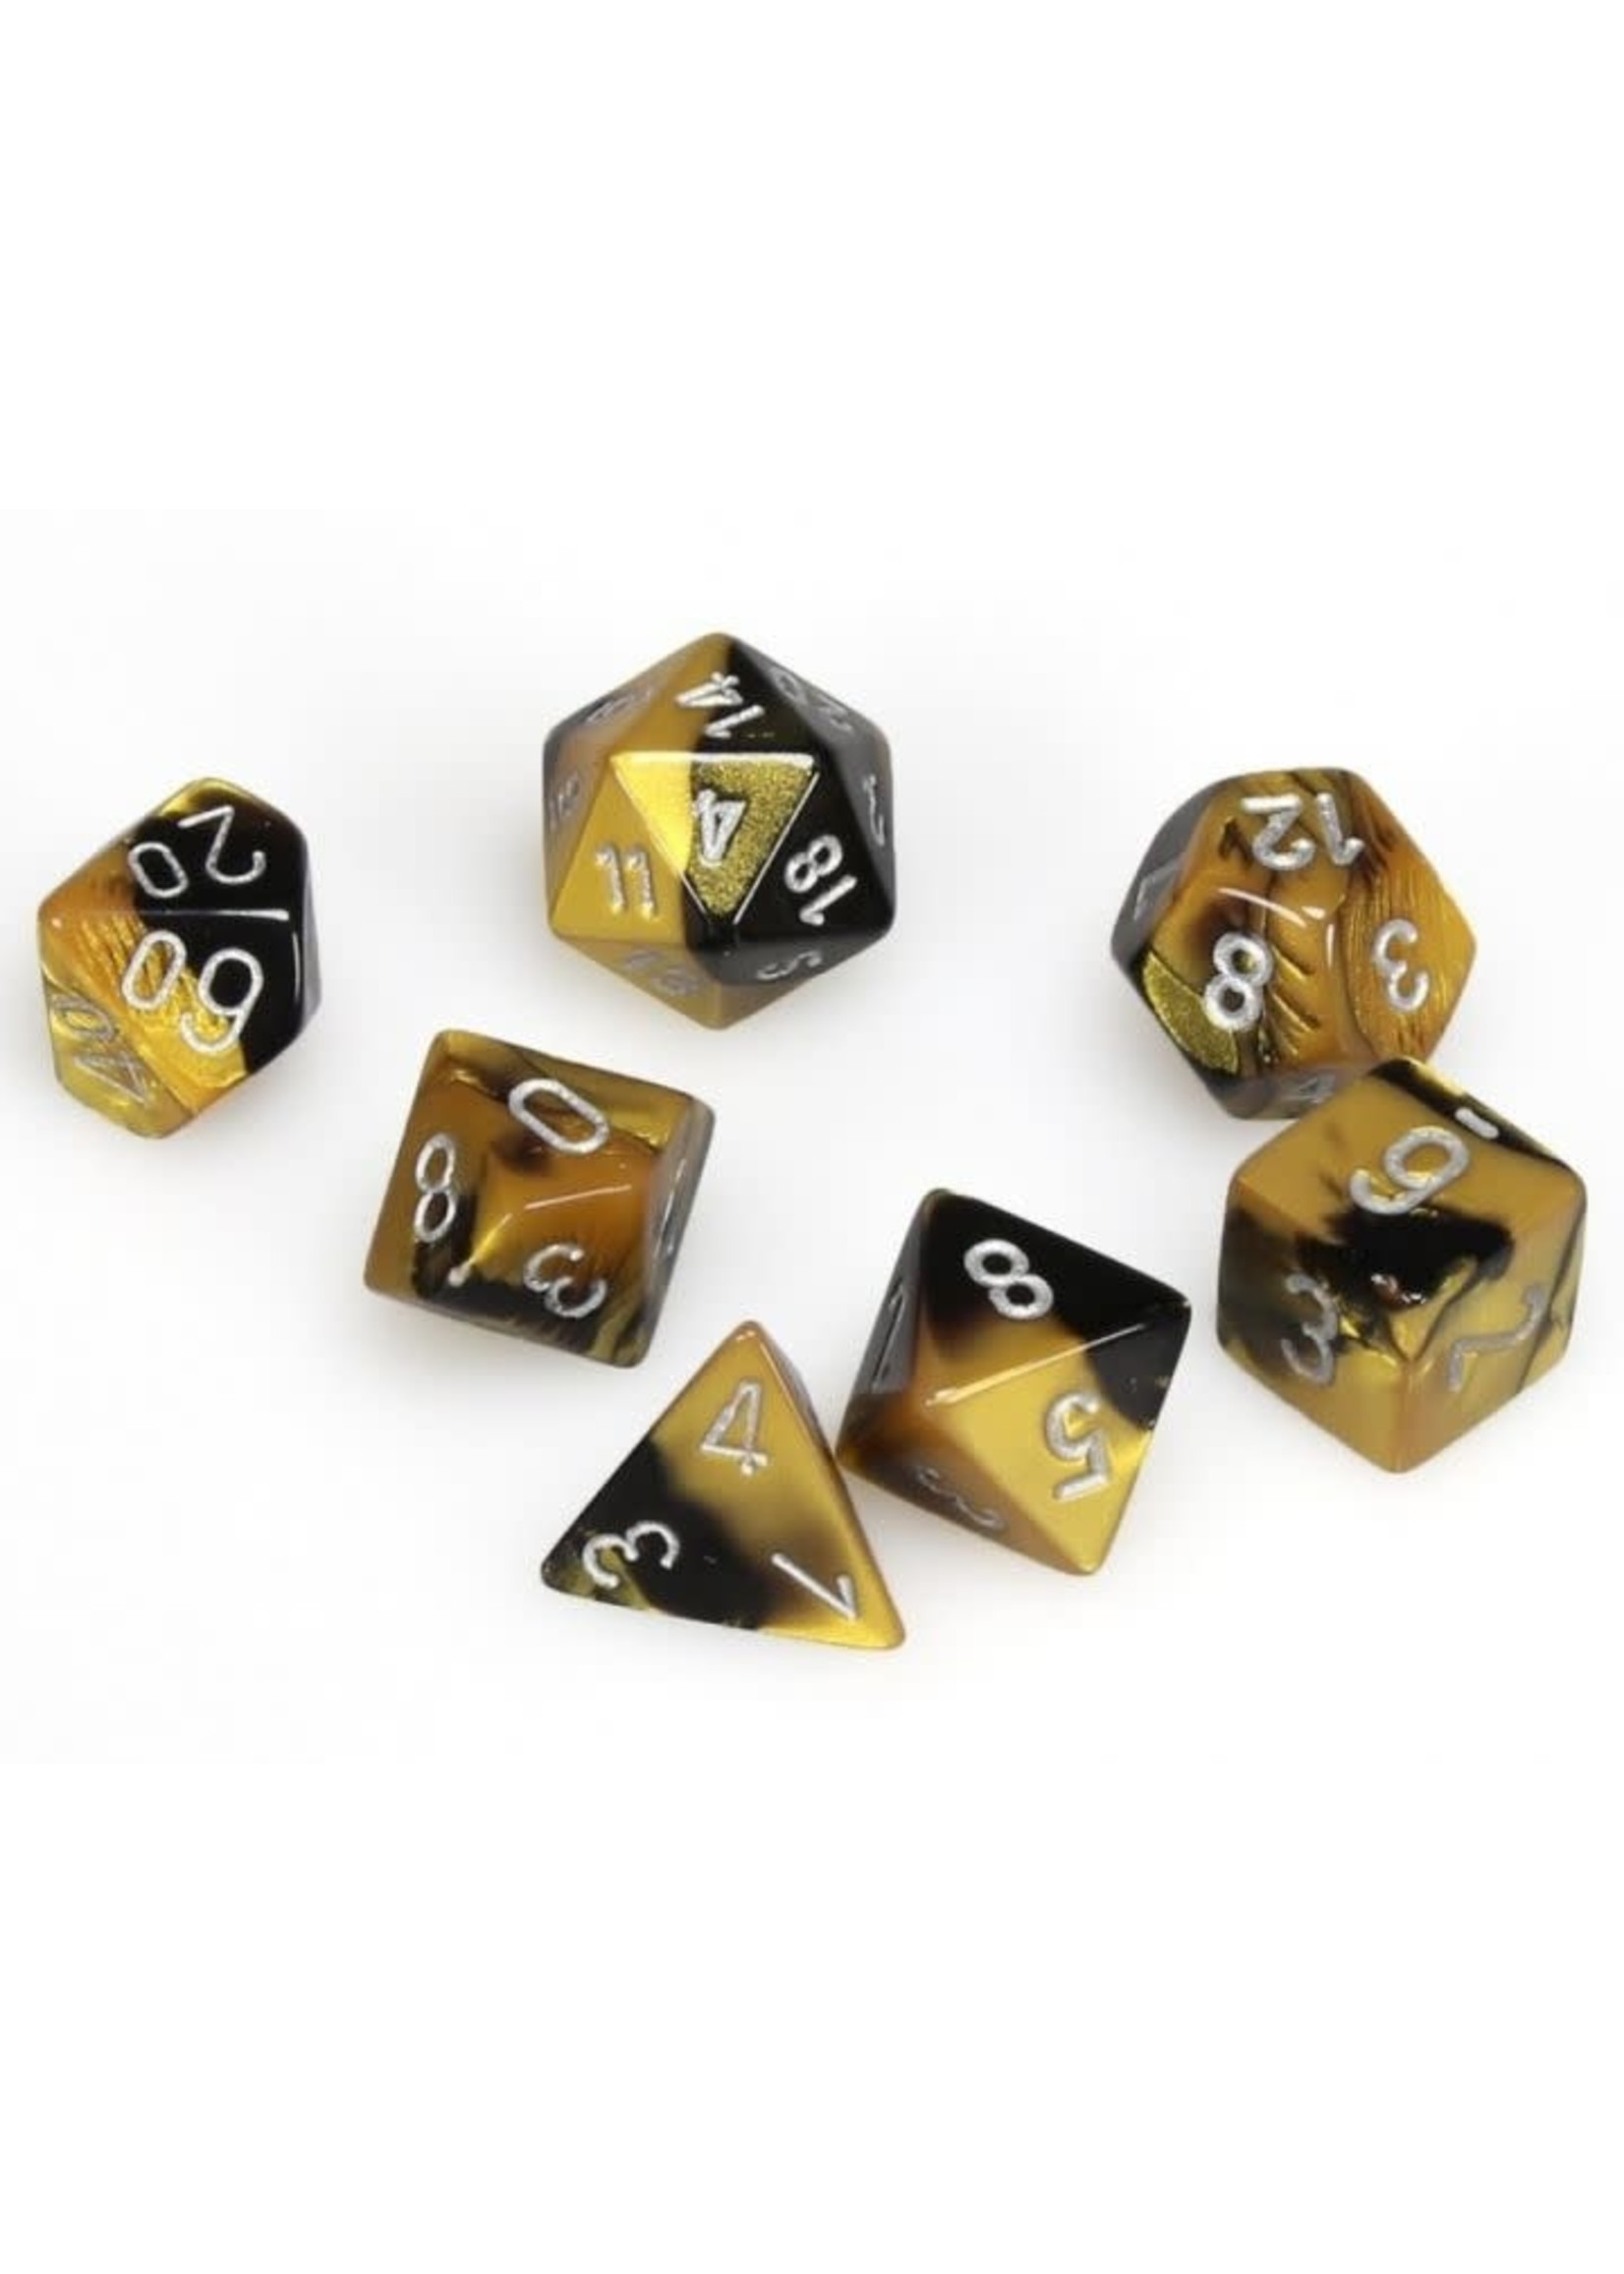 Gemini Polyhedral 7-Die Sets - Black-Gold W/Silver